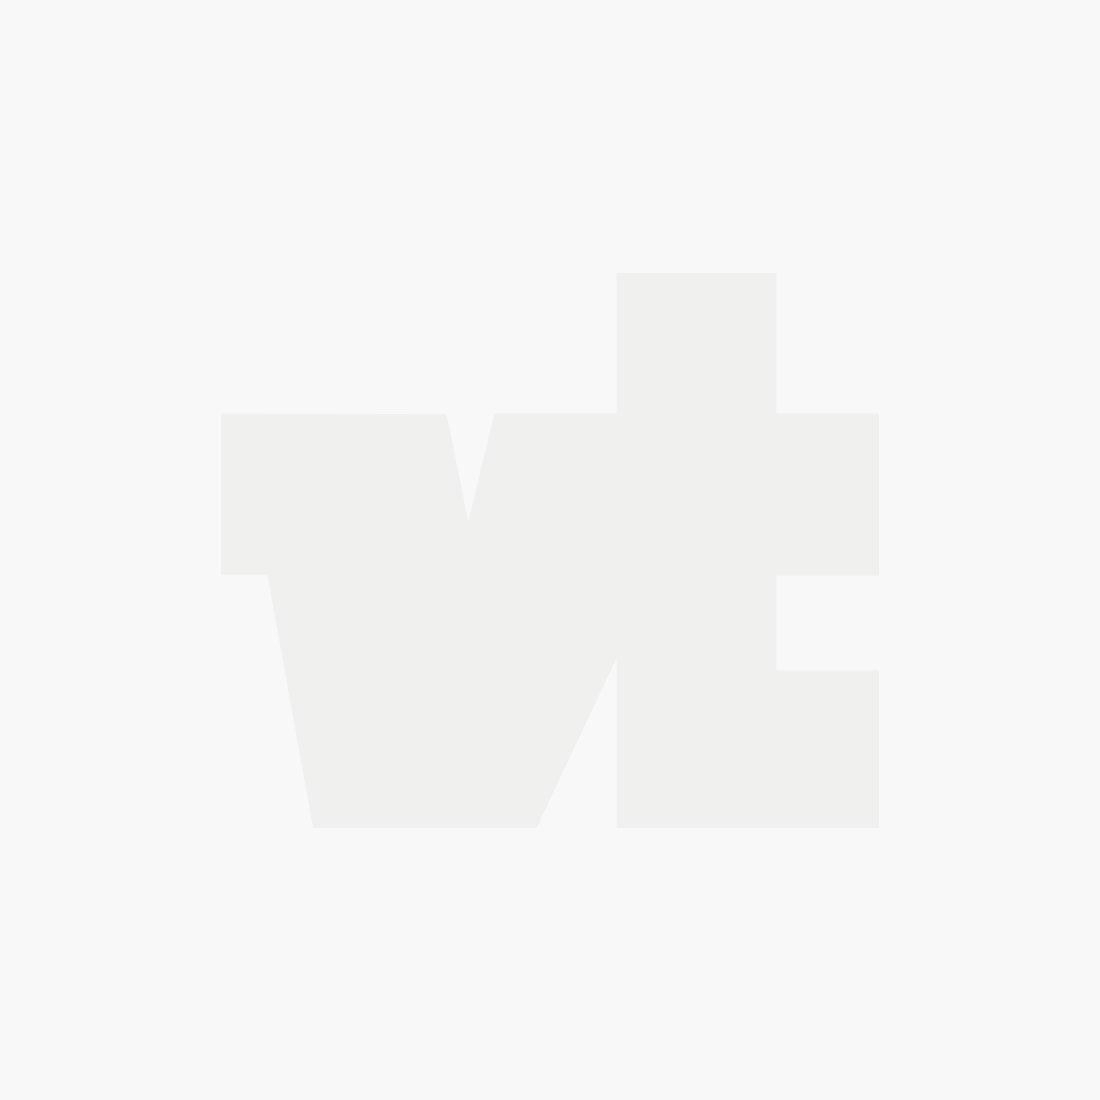 Bridge shirt hj dark pink